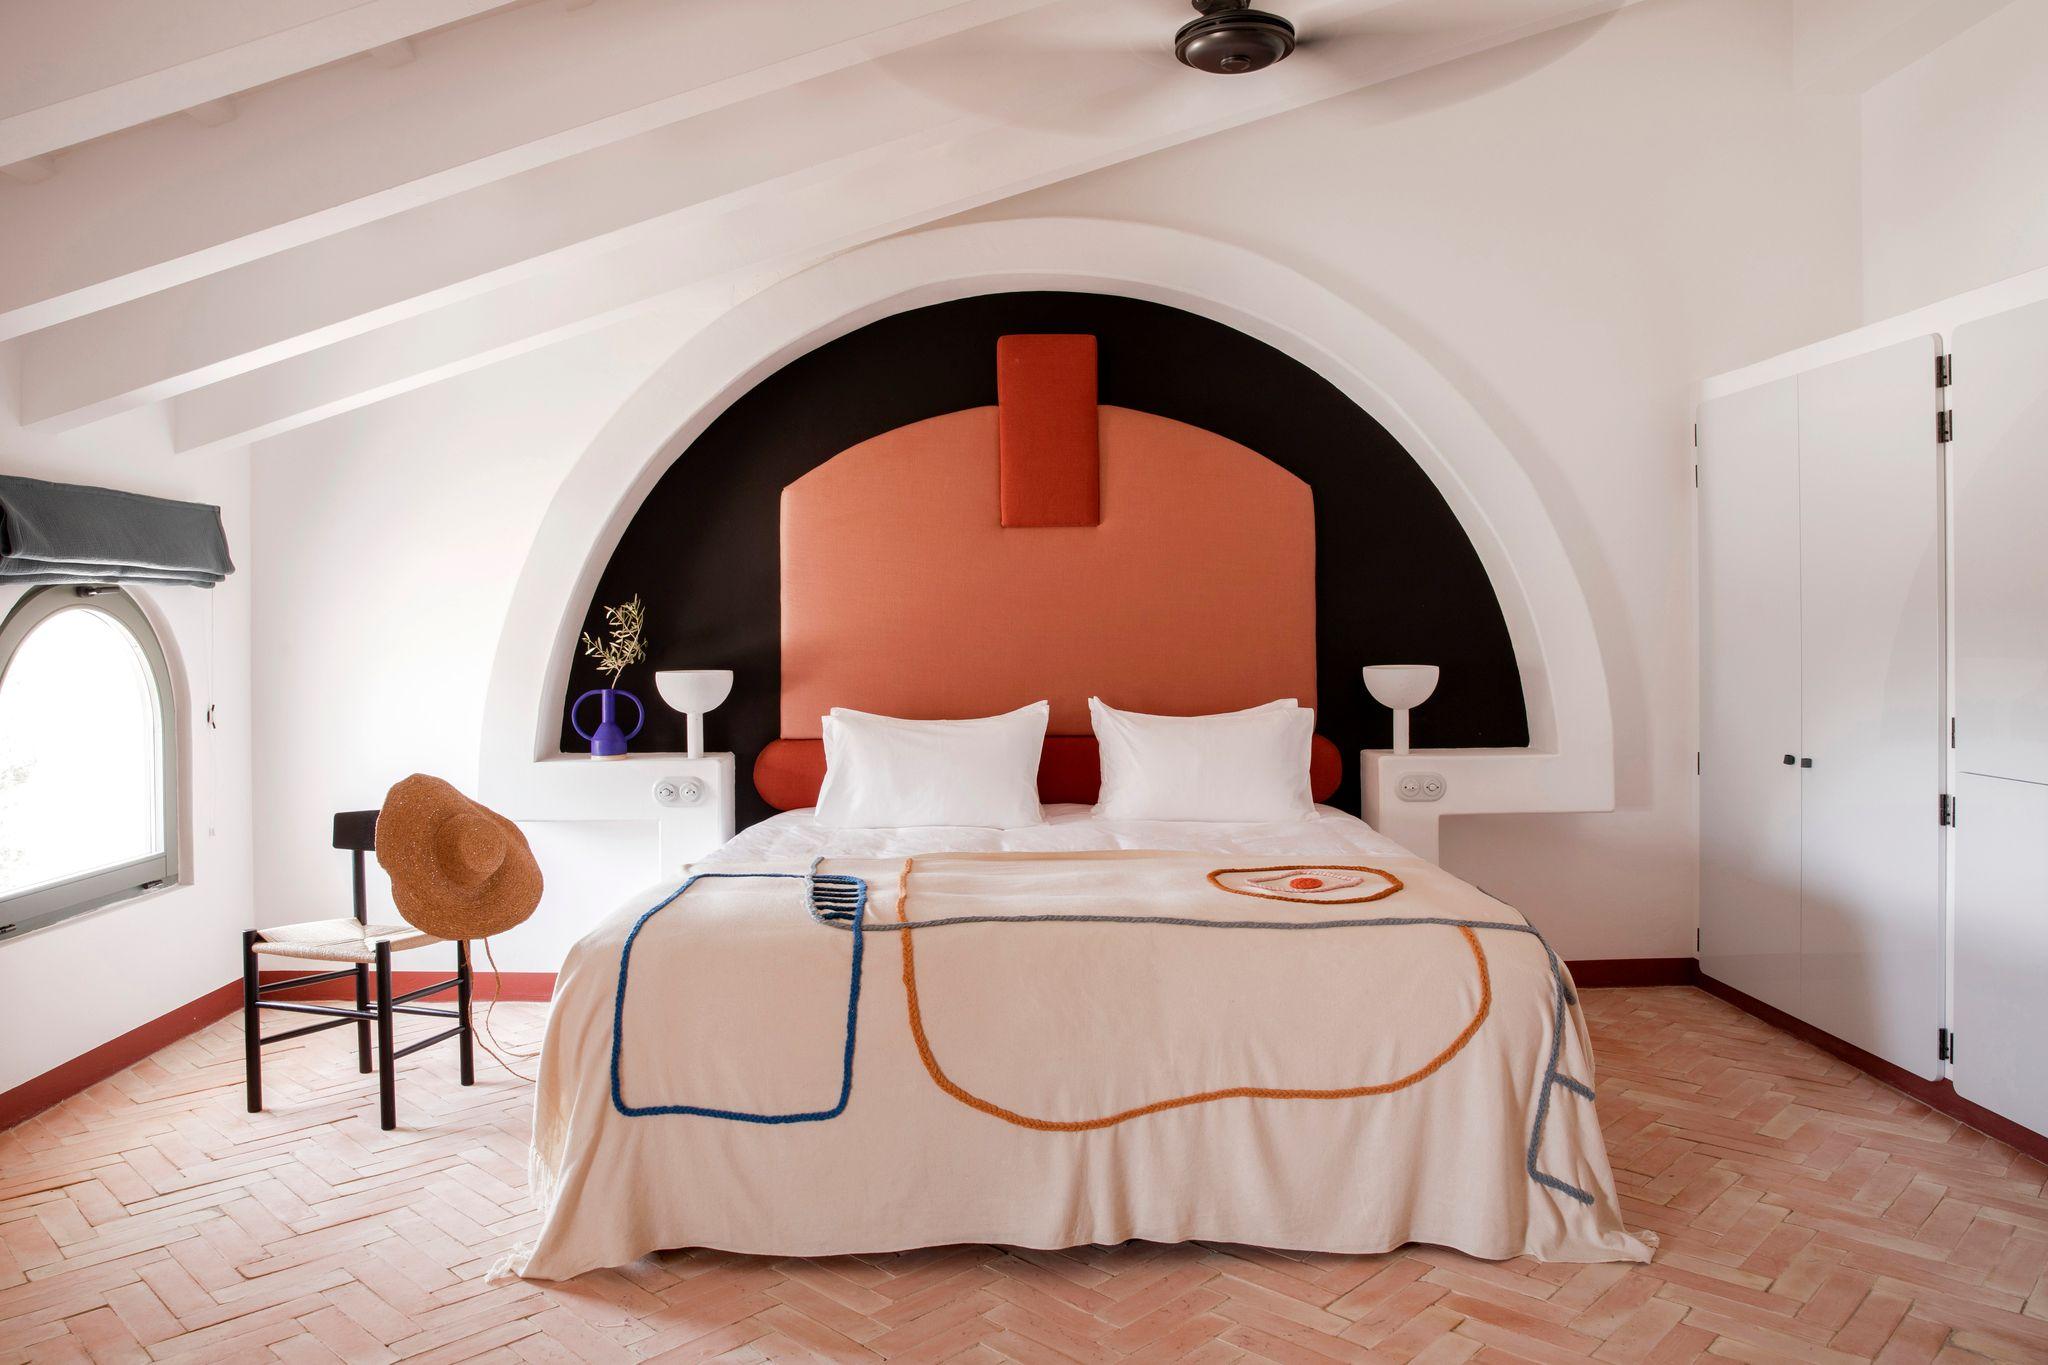 Habitación Son Bou 1 hotel experimental de Menorca